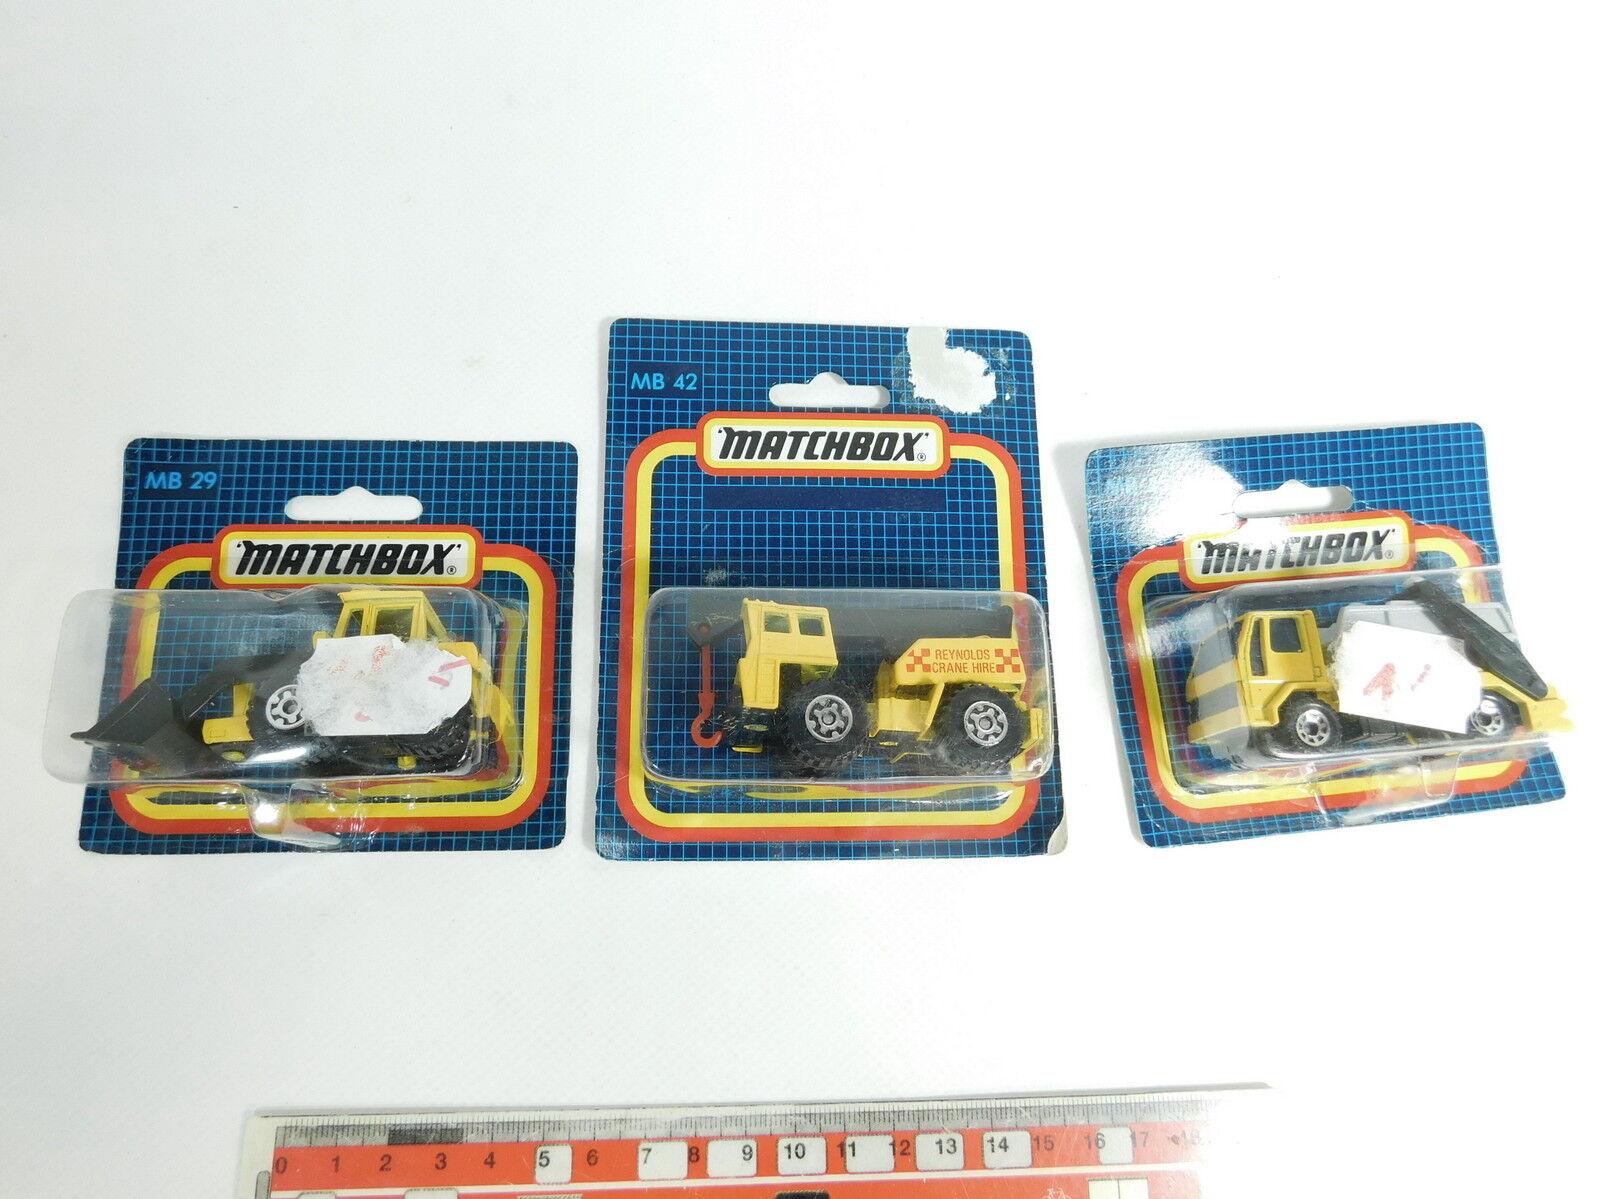 BB793-0,5  3x Matchbox Modèle MB 29 Chargeur à Roues  45 Camion  42,Neuf  Ovp